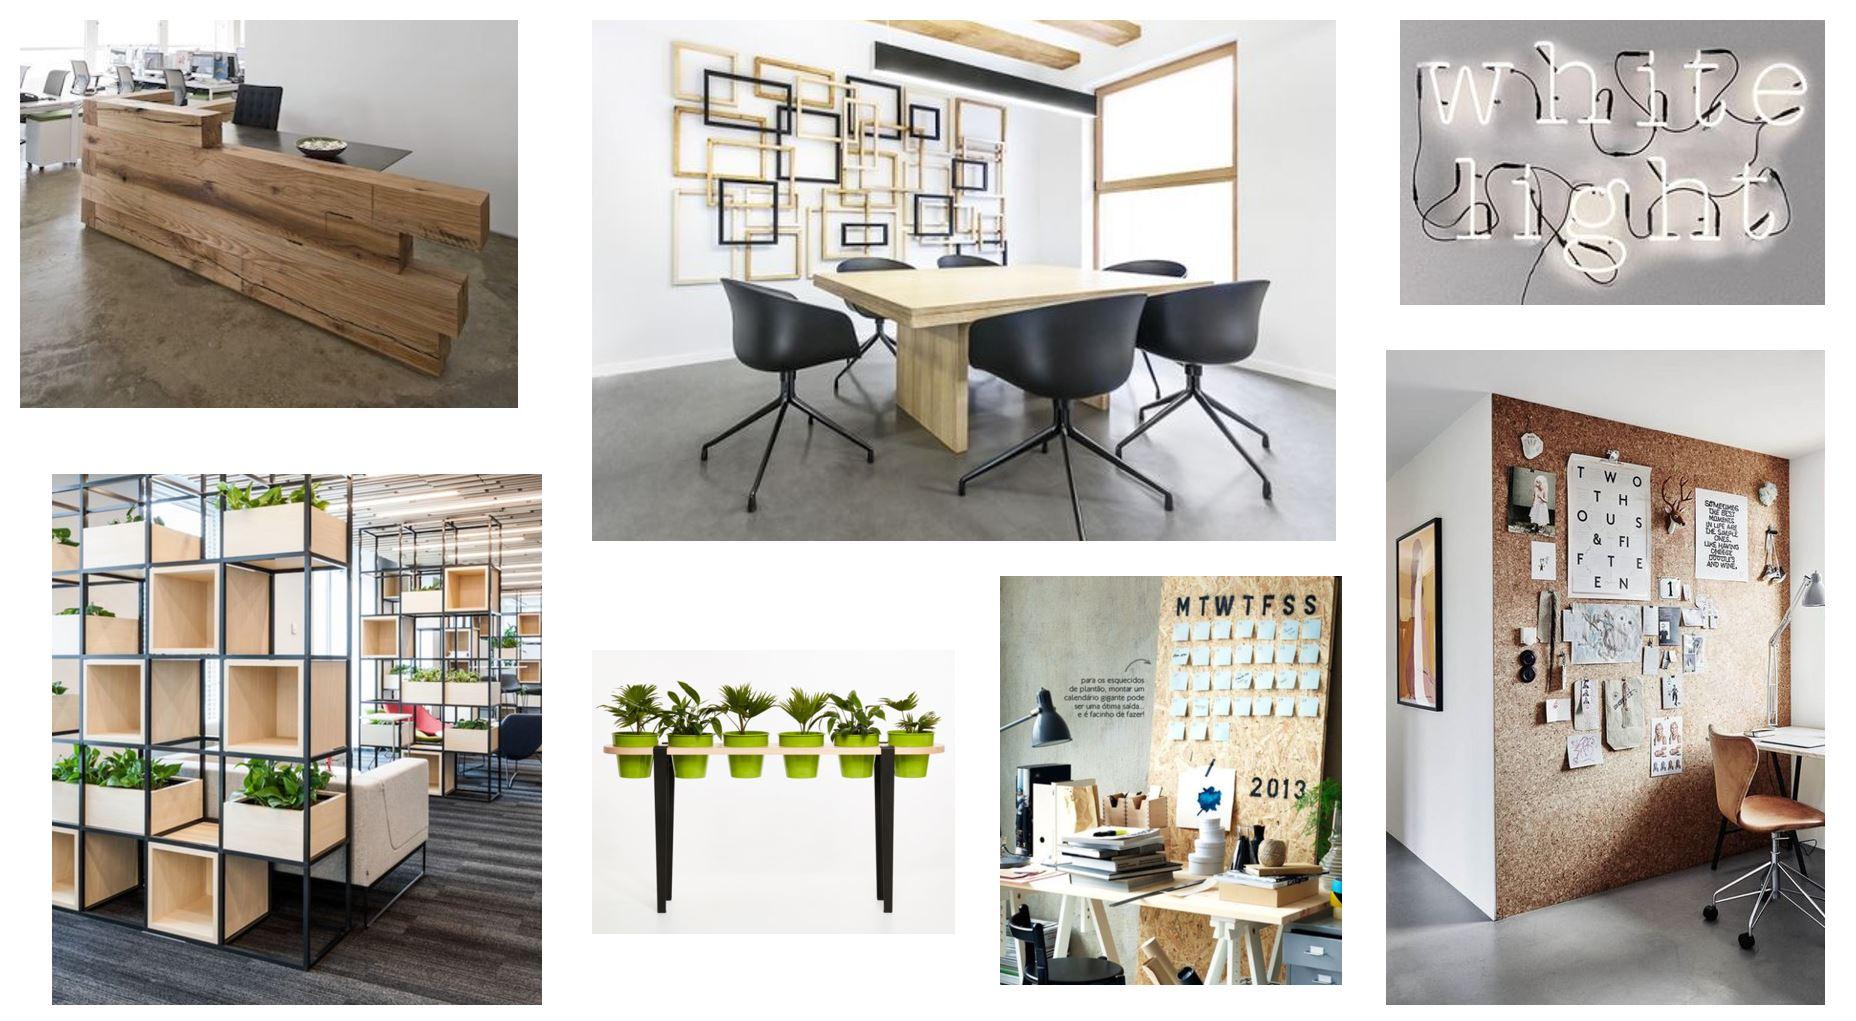 optimiser et agencer un espace de coworking mlaviedeco. Black Bedroom Furniture Sets. Home Design Ideas